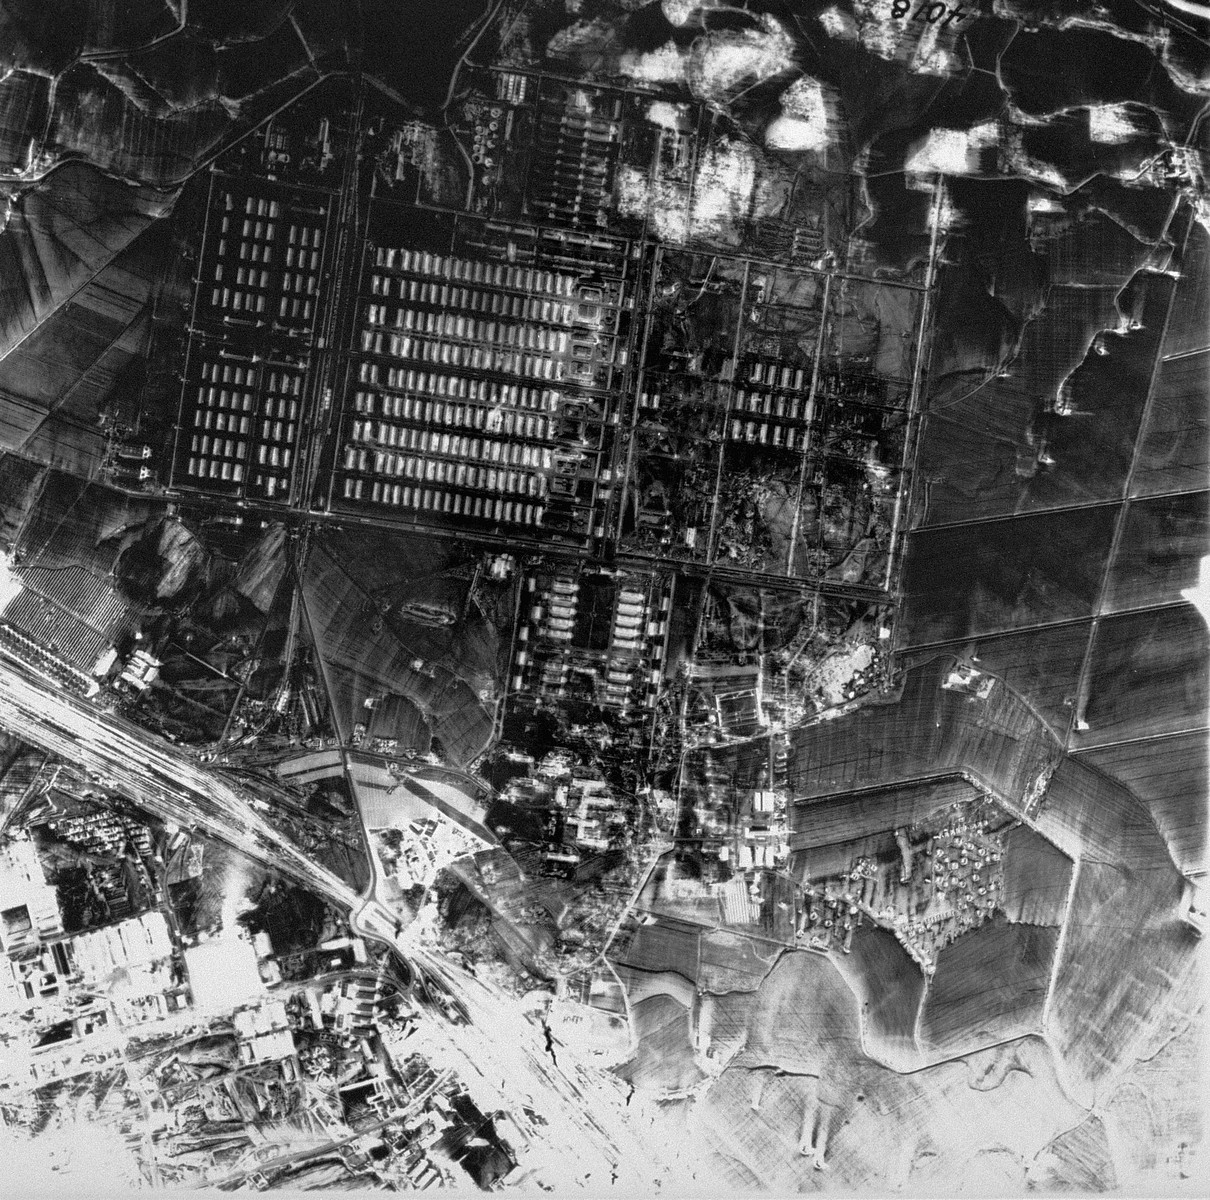 An aerial reconnaissance photograph showing Auschwitz II (Birkenau). [oversized photograph]